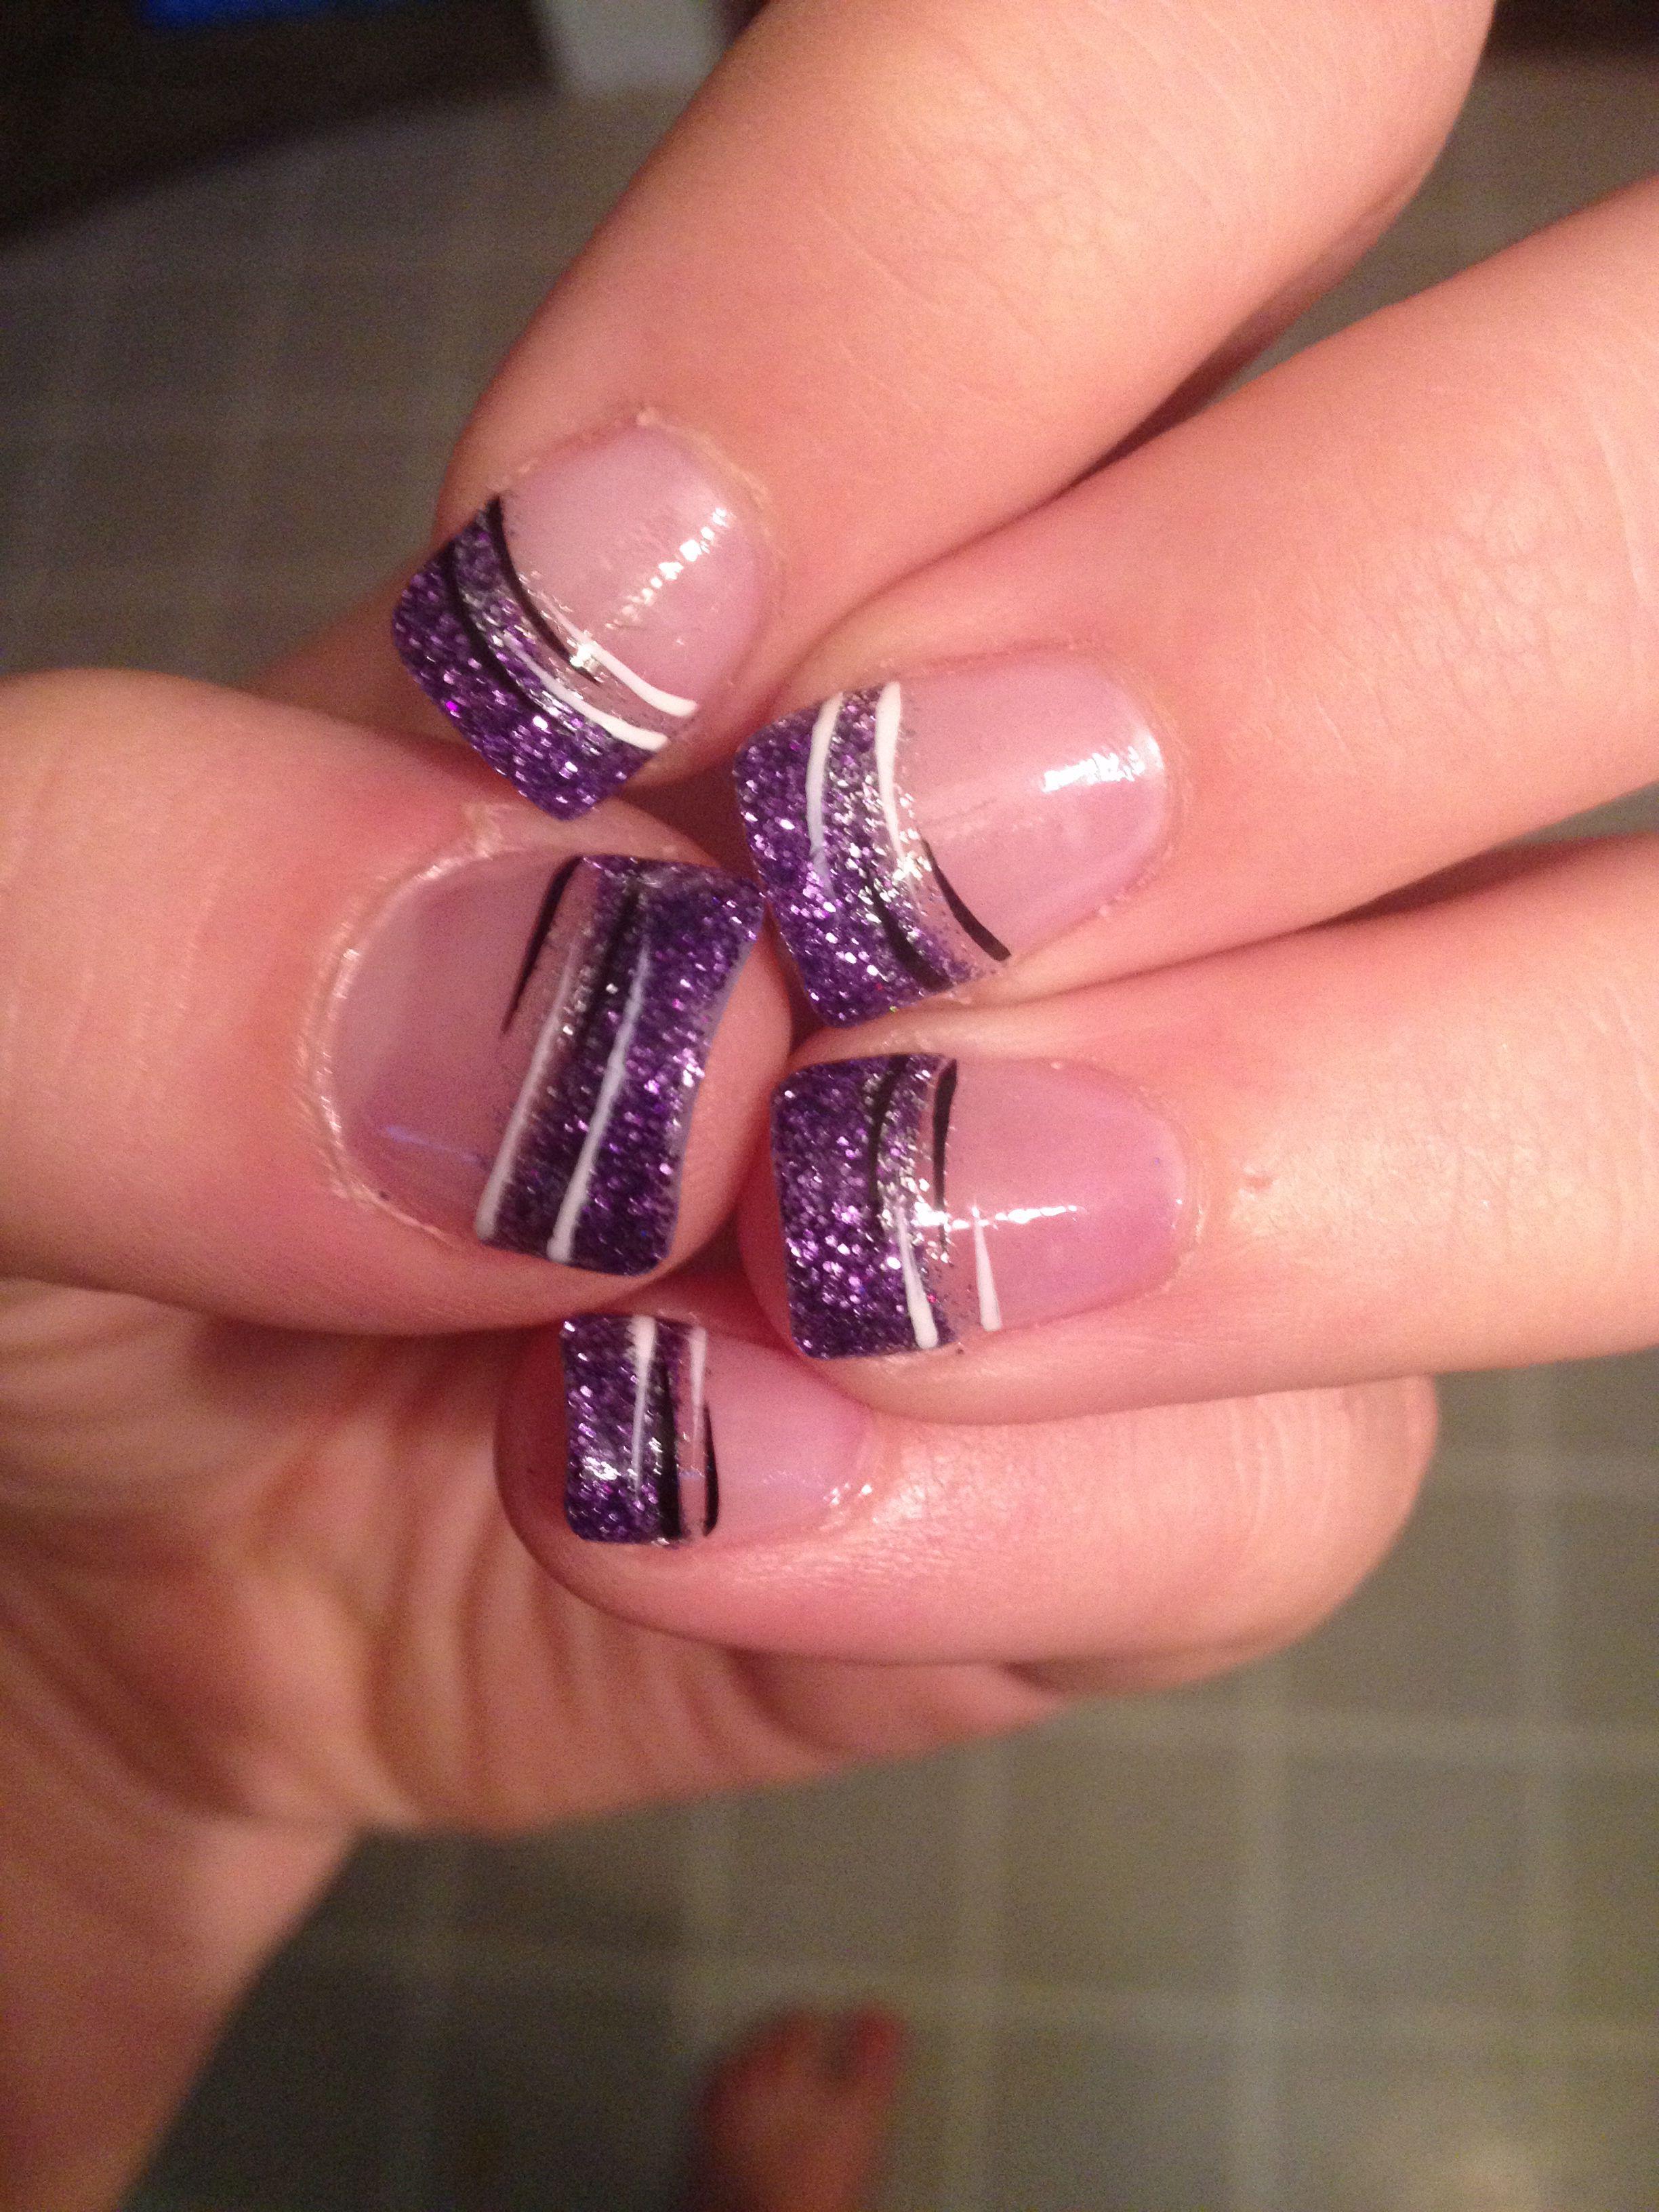 Pin By Terri Shaw On Beauty Purple Gel Nails Nail Designs Gel Nail Art Designs